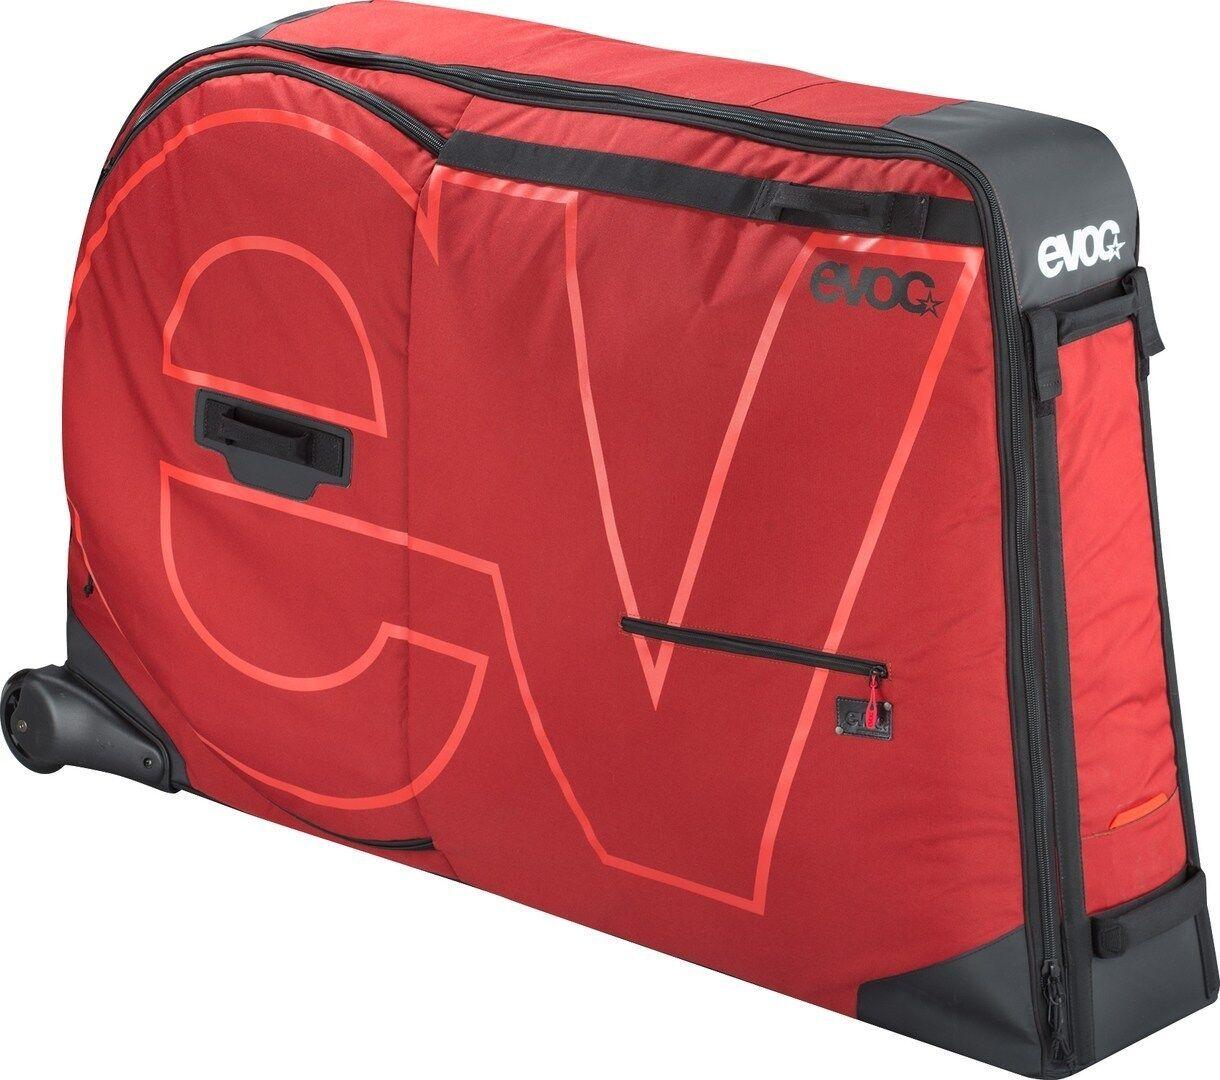 Evoc Bike Travel Bag 285L  - Red - Size: One Size